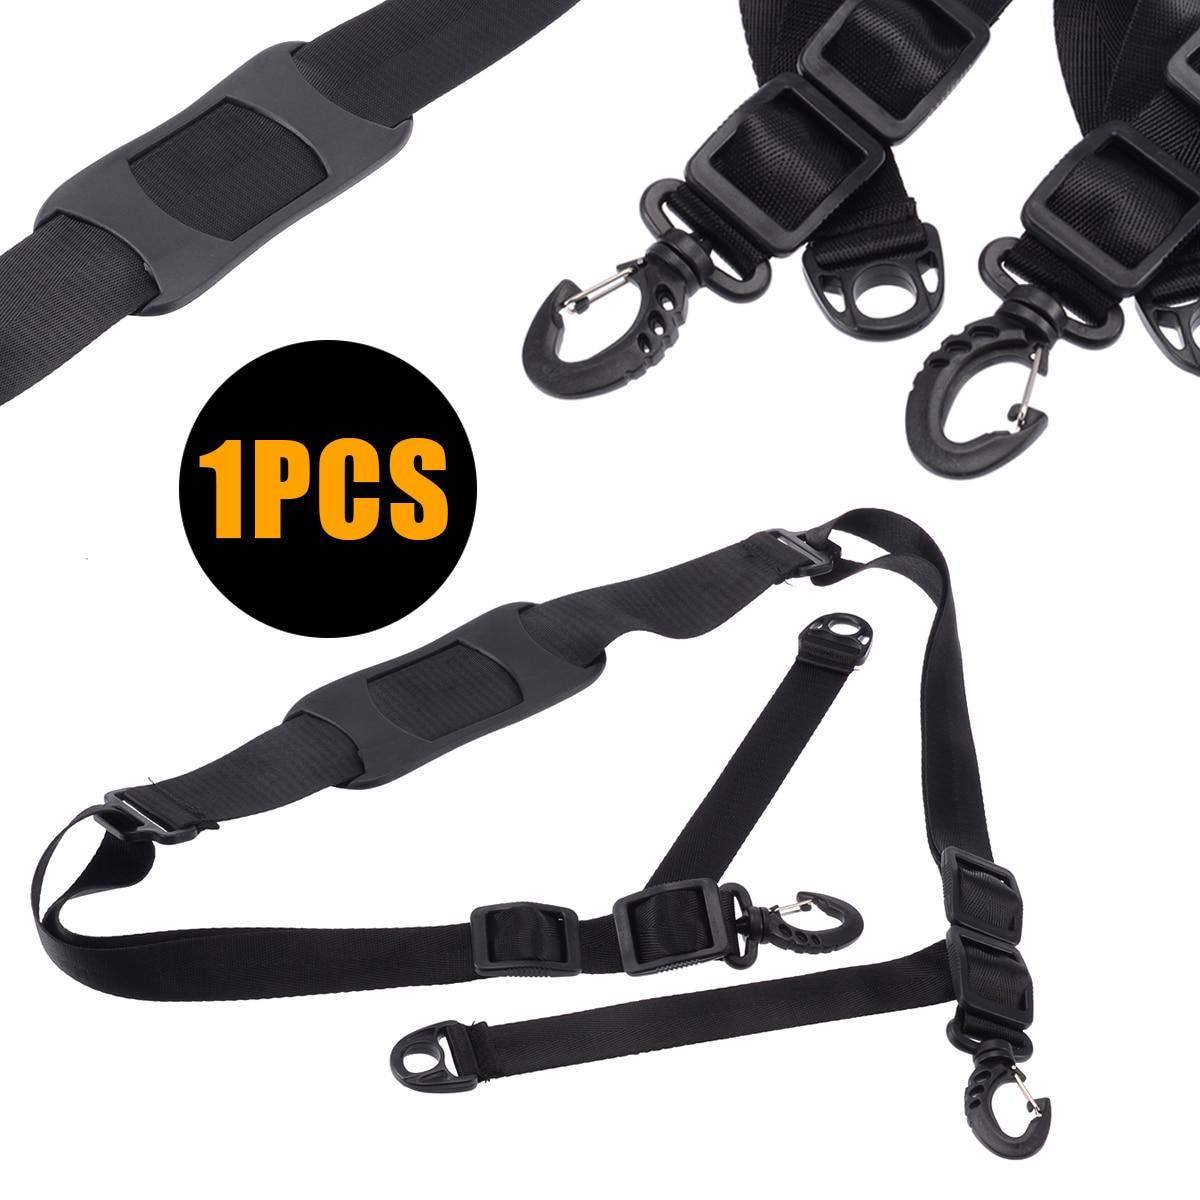 1Pcs Black Carrying Belt Scooter Skateboard Hand Carrying Handle Shoulder Strap Belt For Xiaomi Mijia M365 Scooter